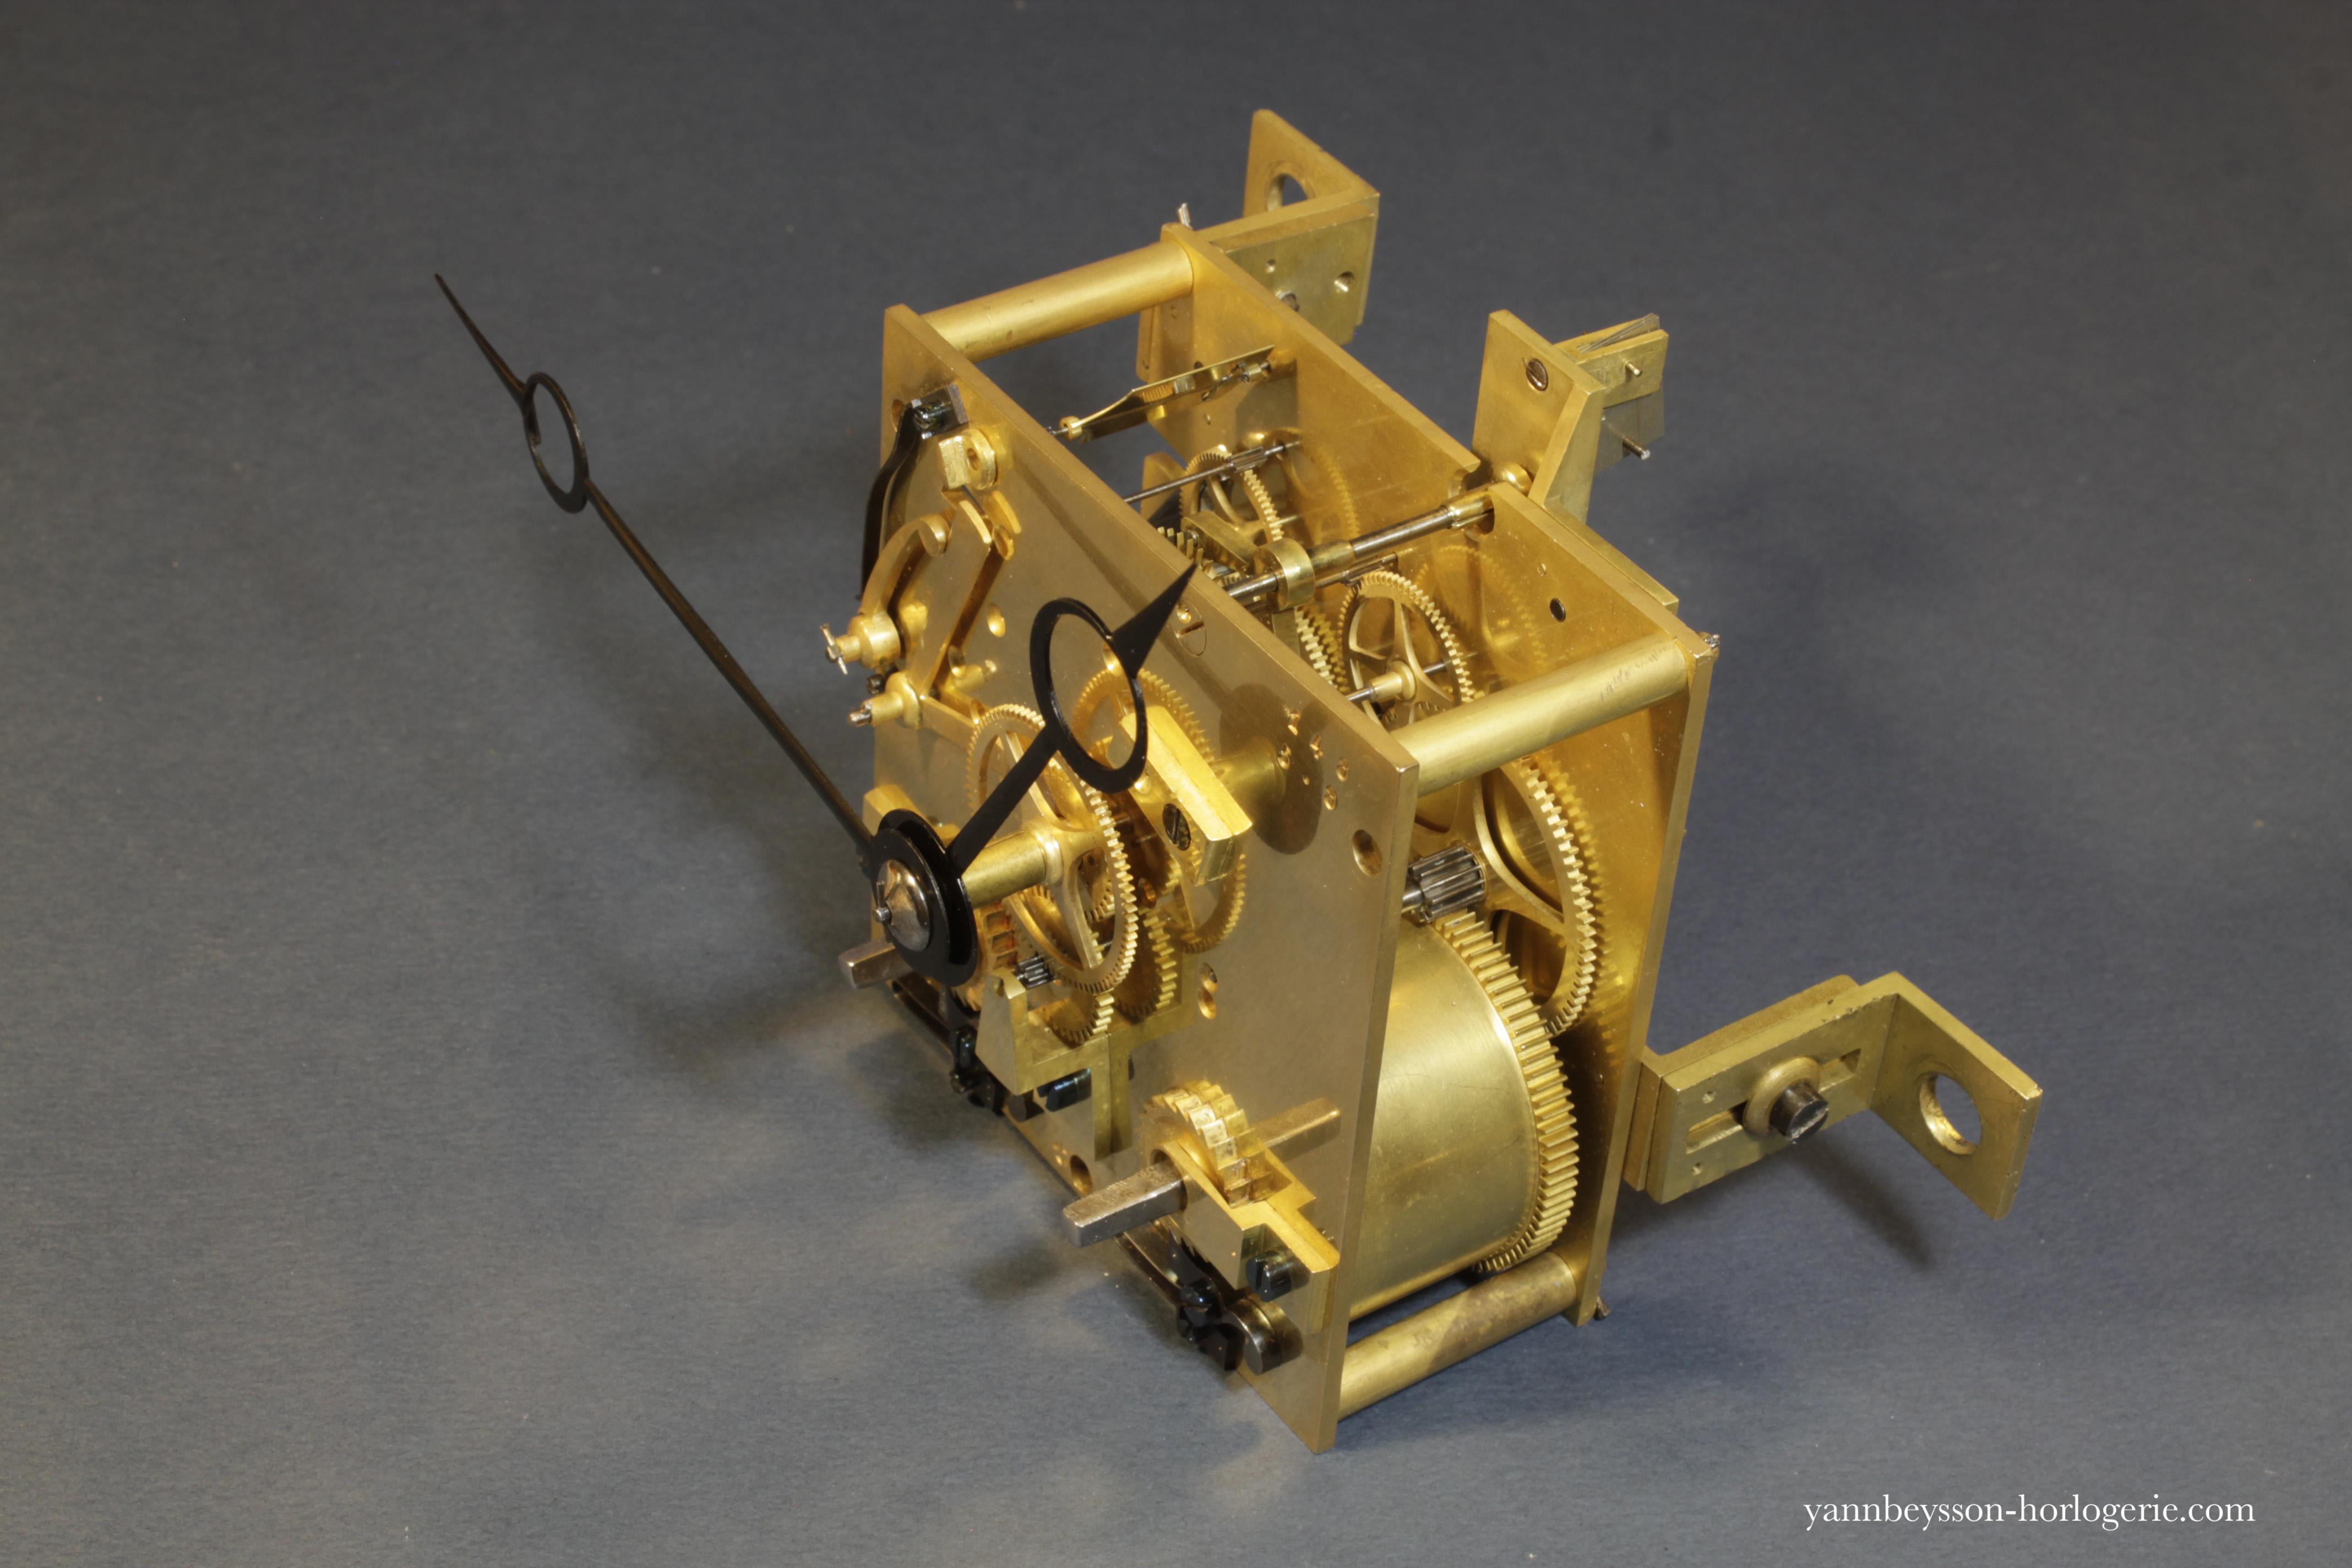 mecanisme-pendule-sonnerie-XIX-horlogerie-yann-beysson